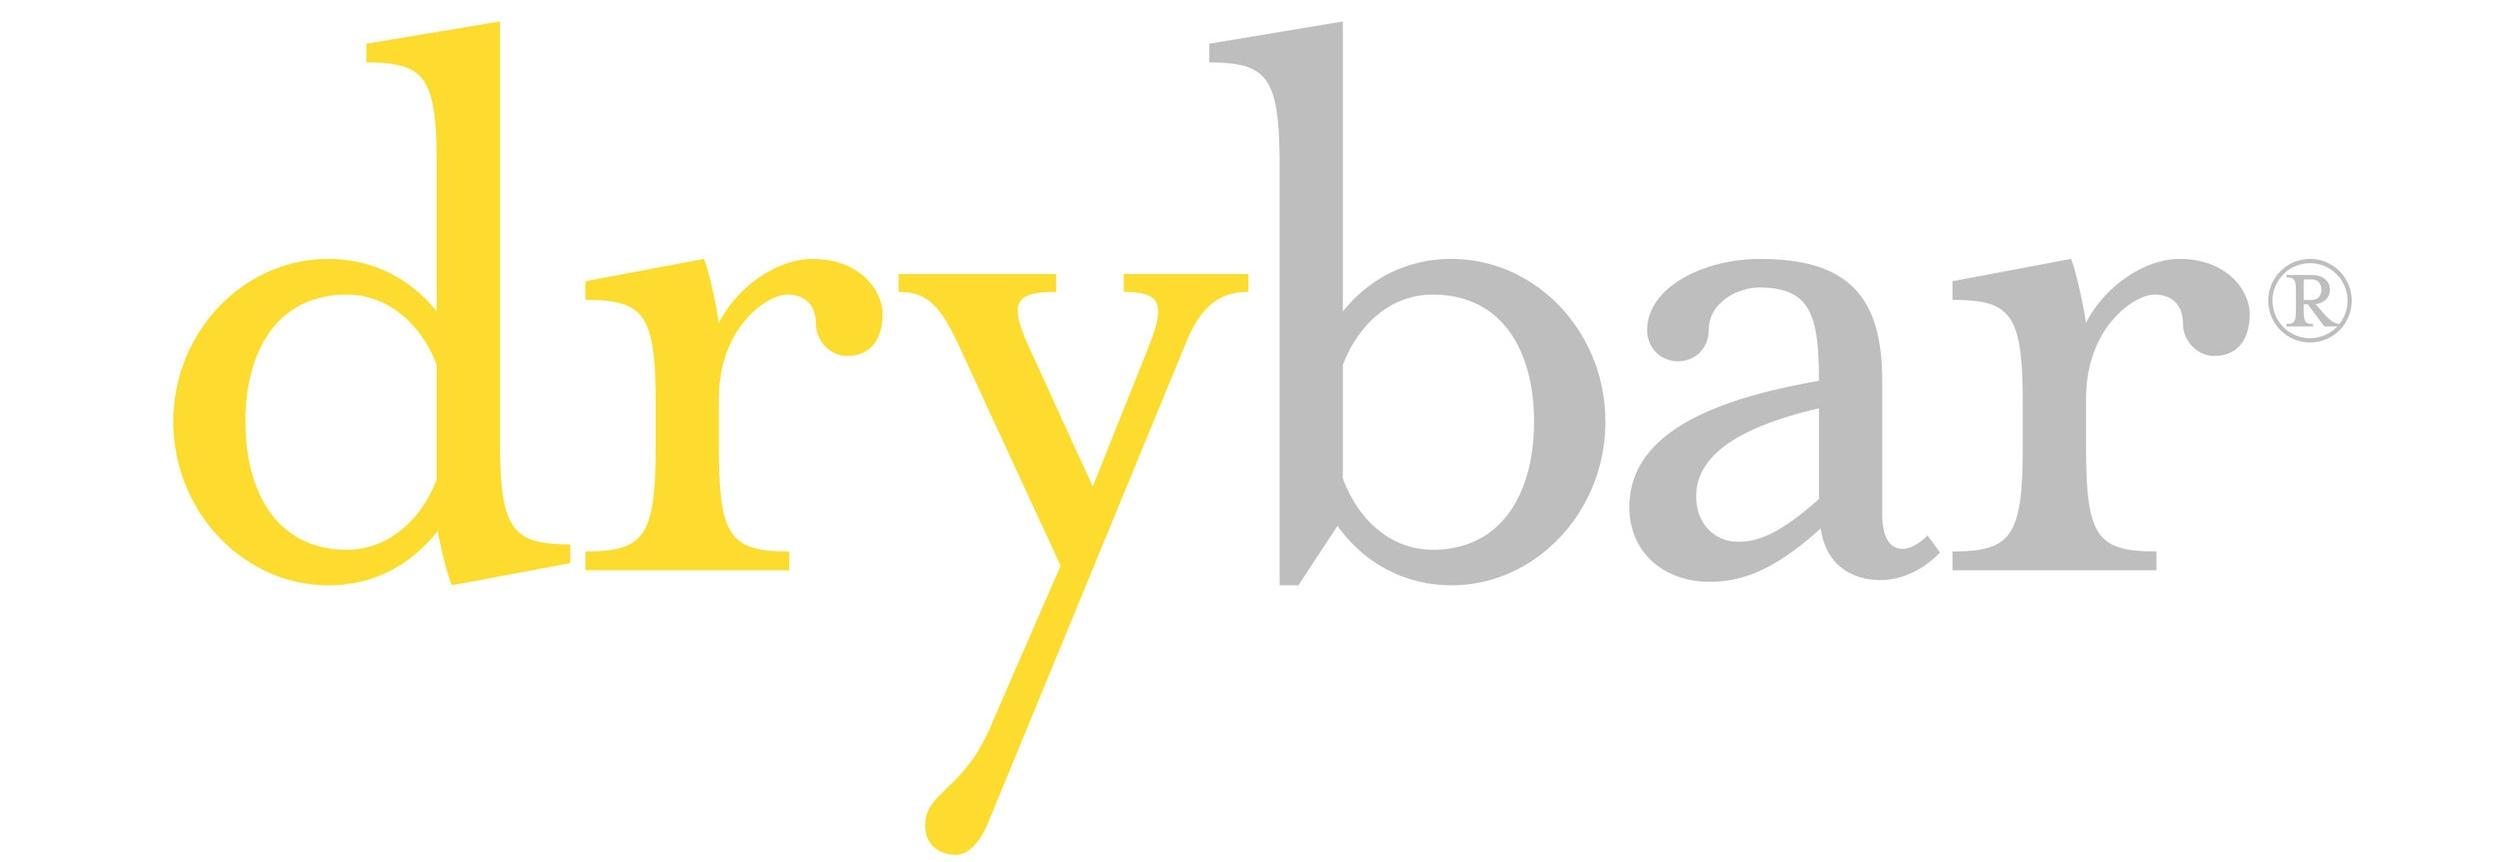 Drybar_logo.jpg